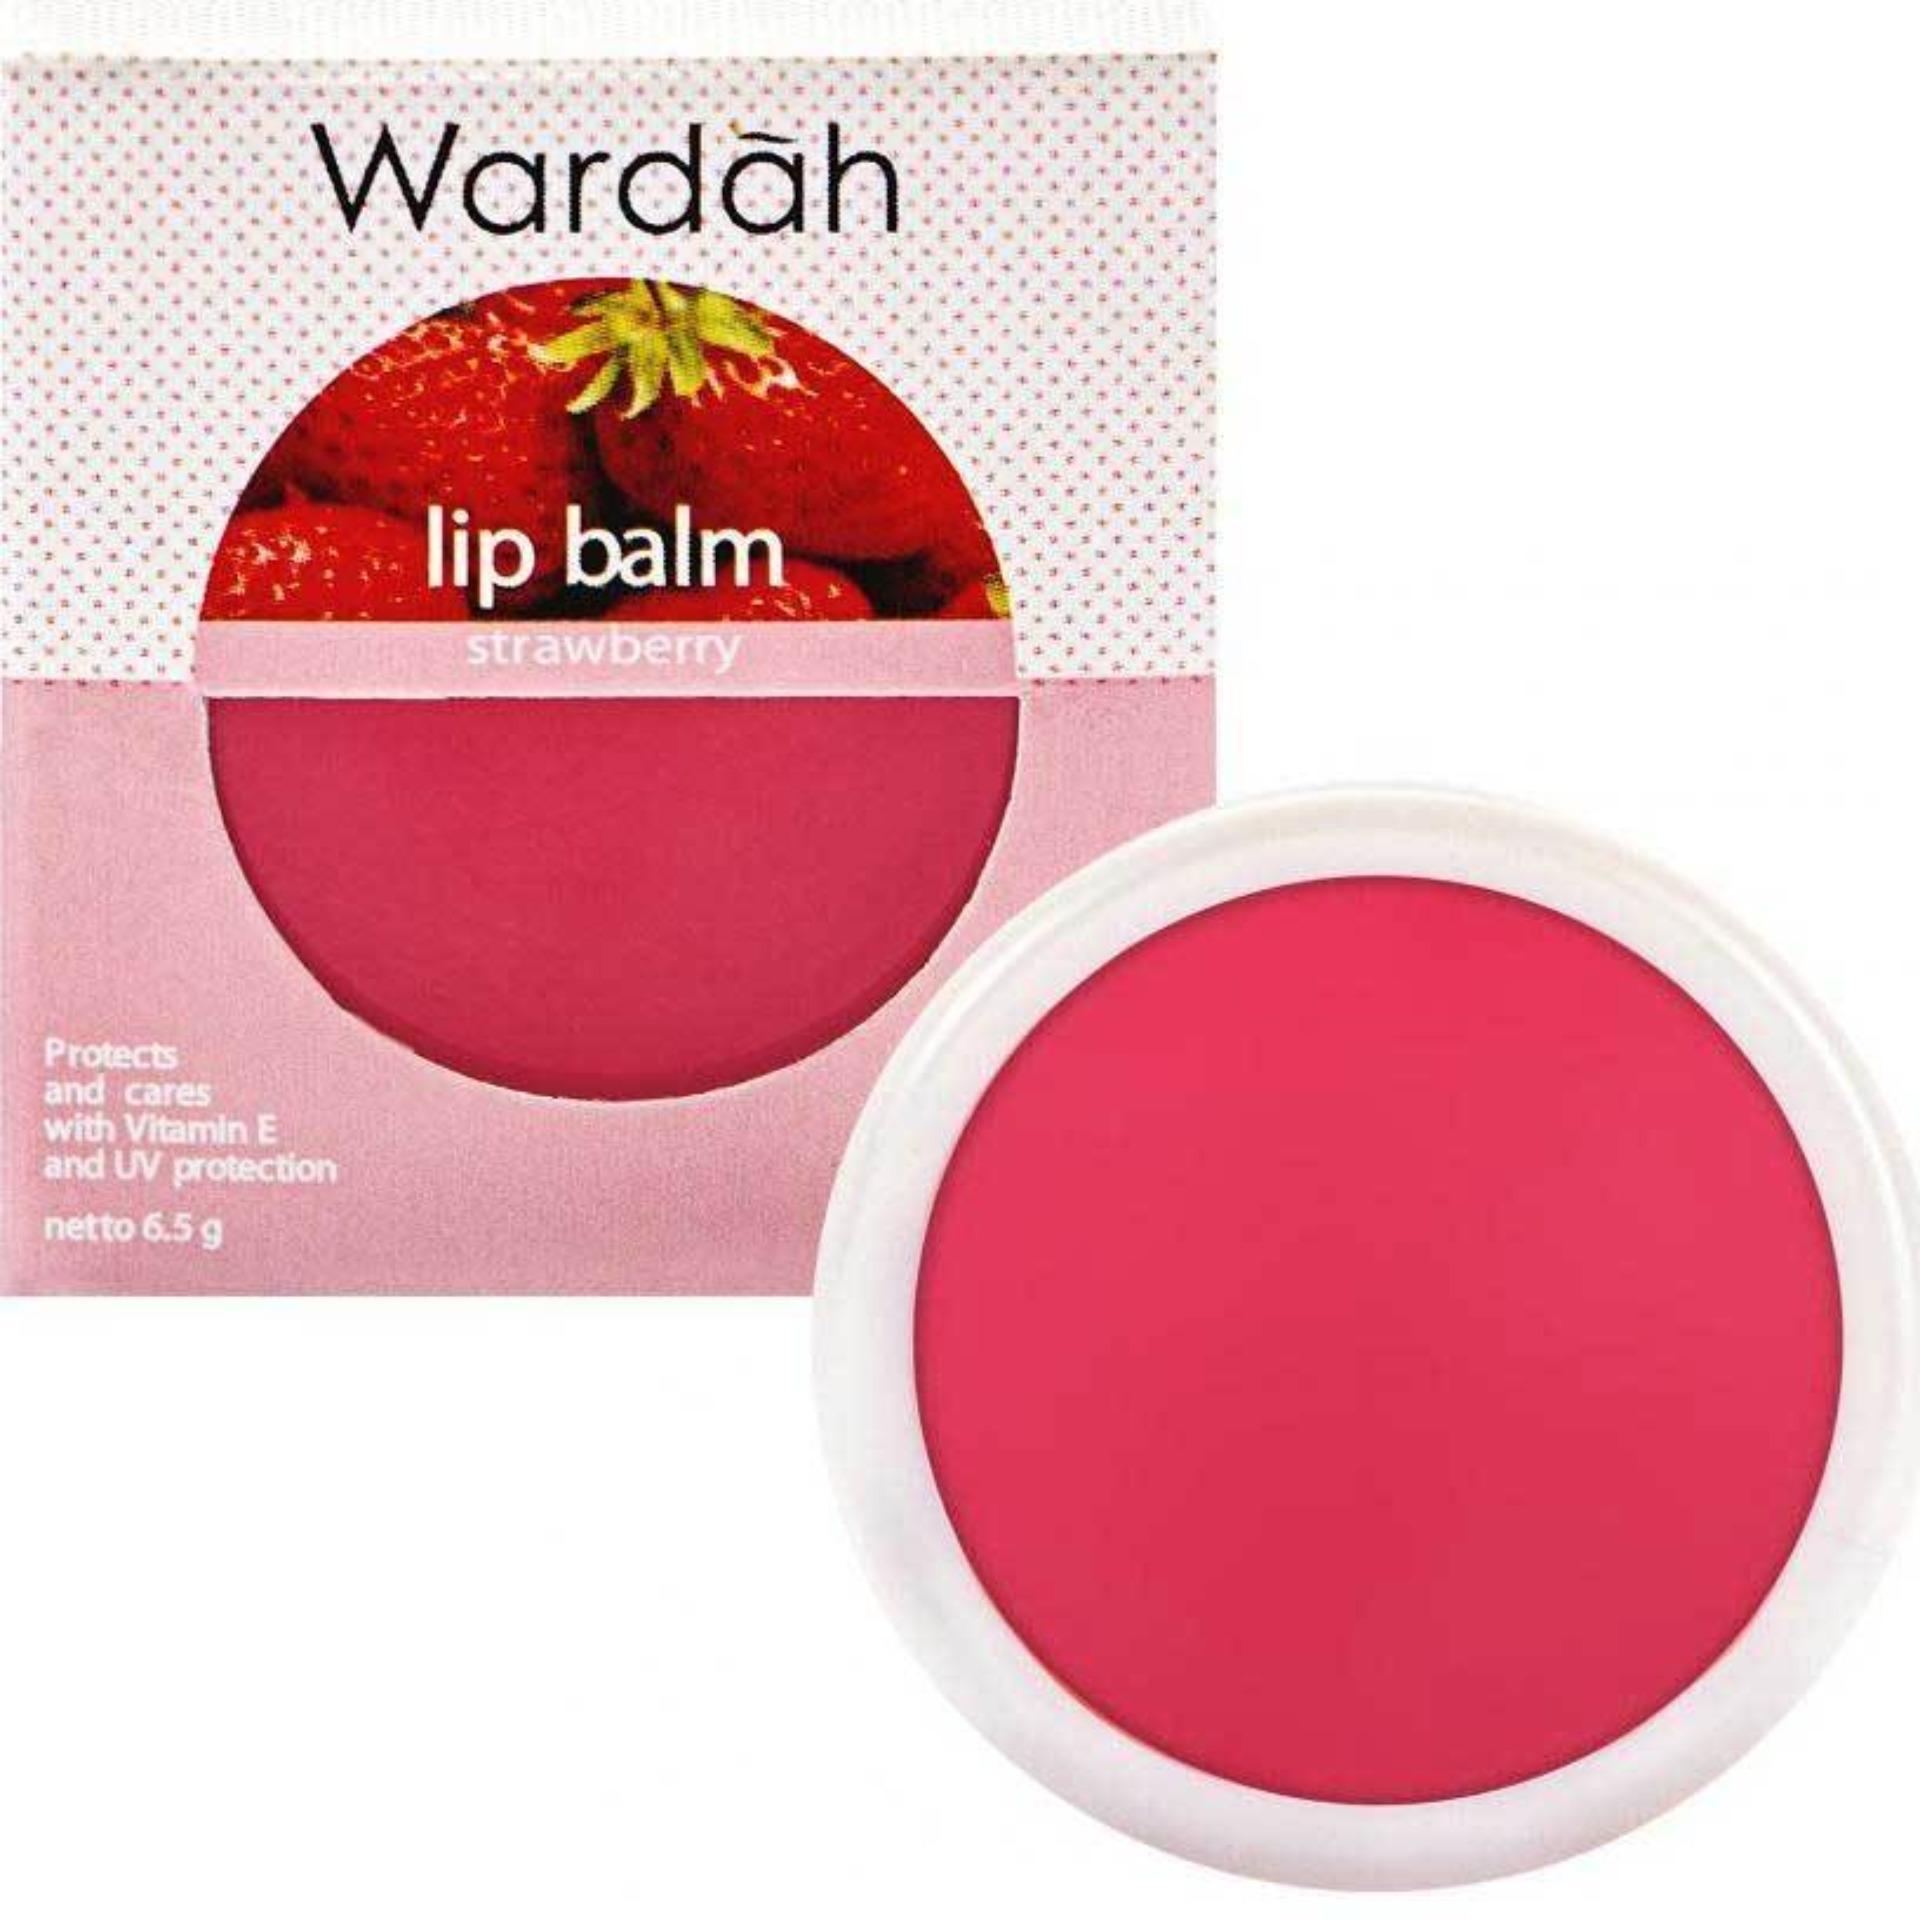 Wardah Lip Balm Strawberry